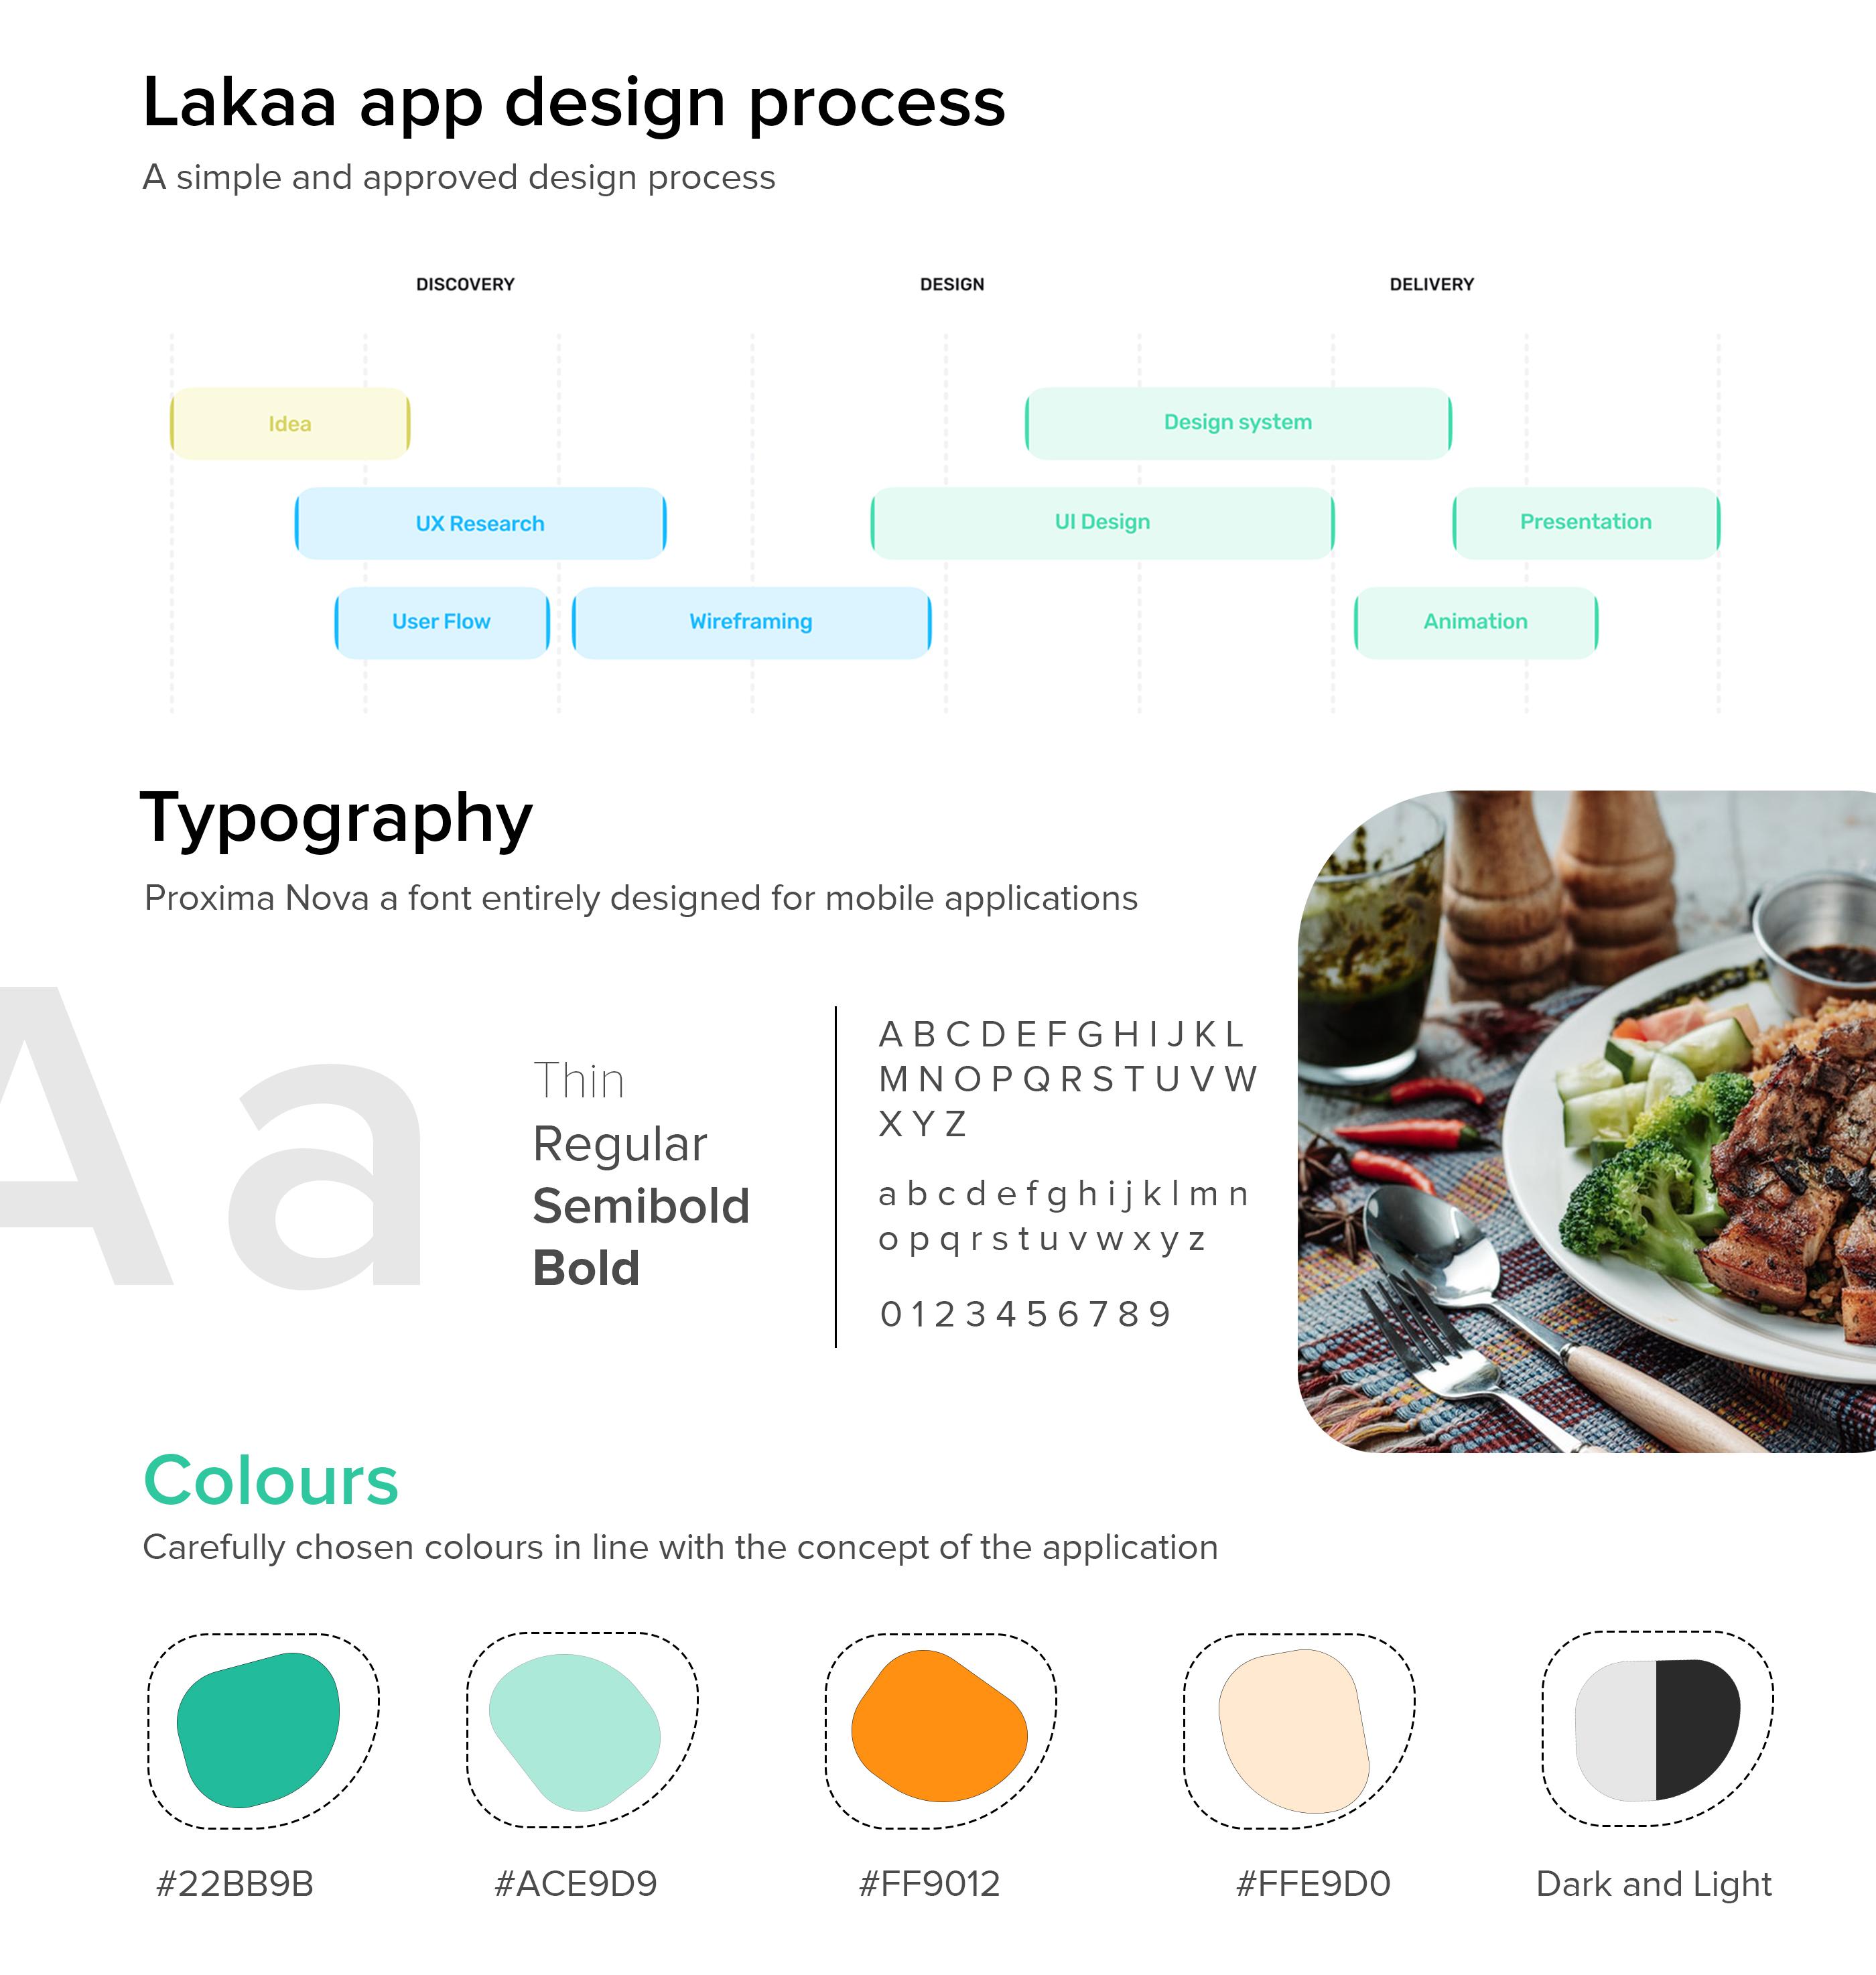 Lakaa food delivery app design process - flutter ui kit design